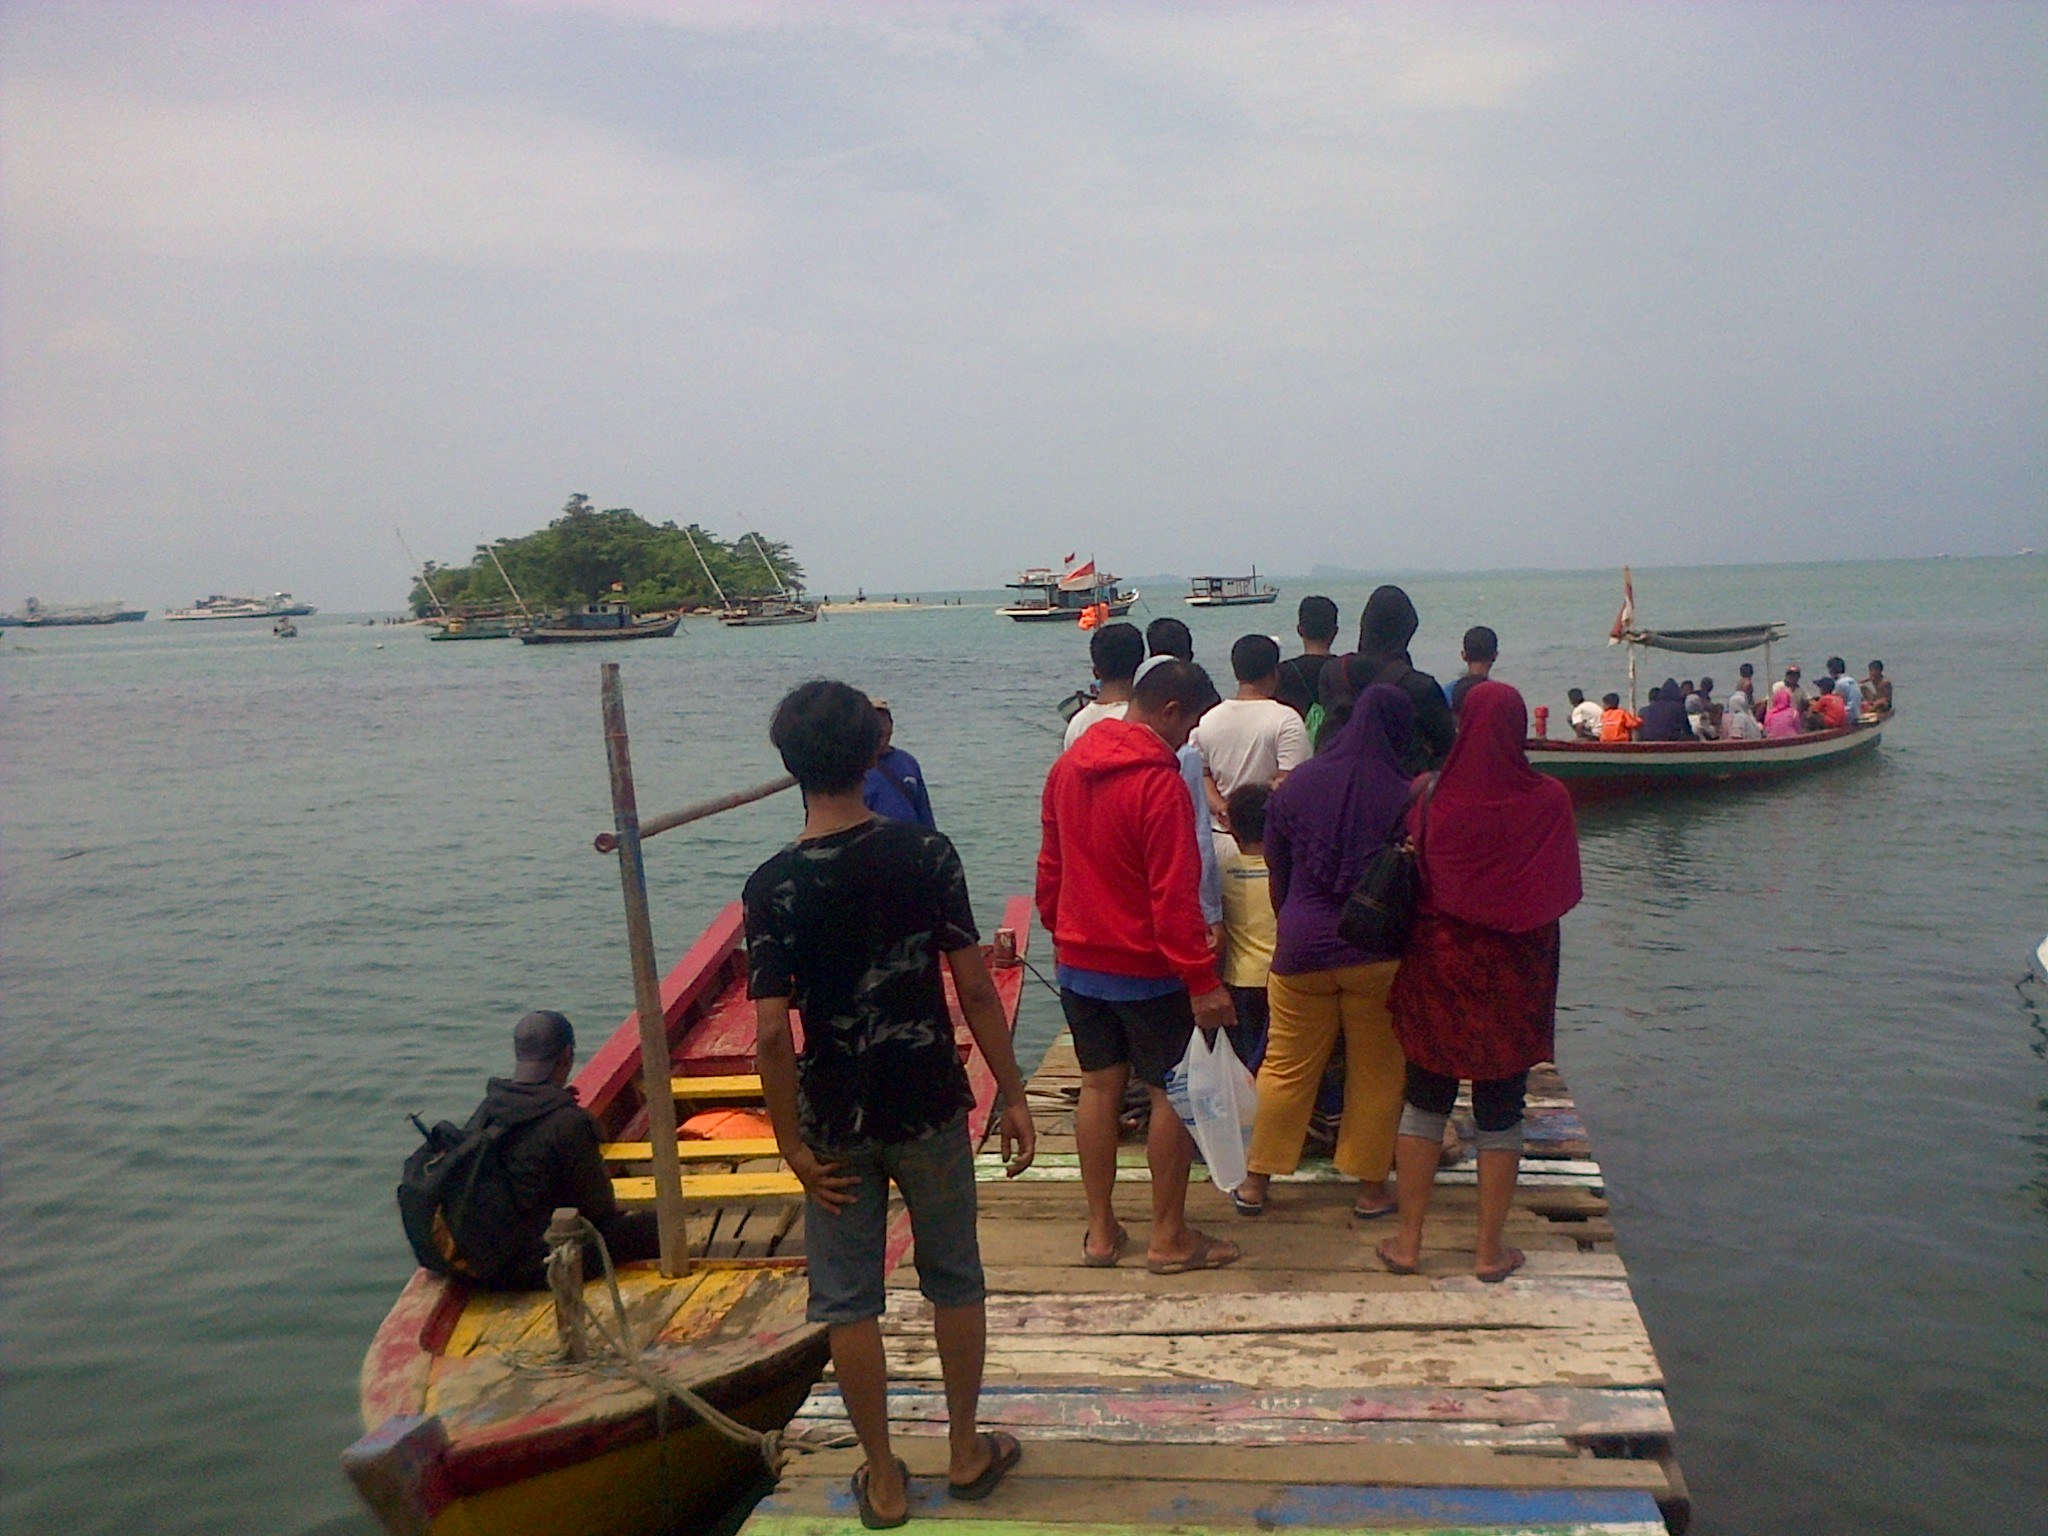 Pulau Merak Kecil Wisata Pantai Alternatif Kota Cilegon Wisatawan Menyeberang